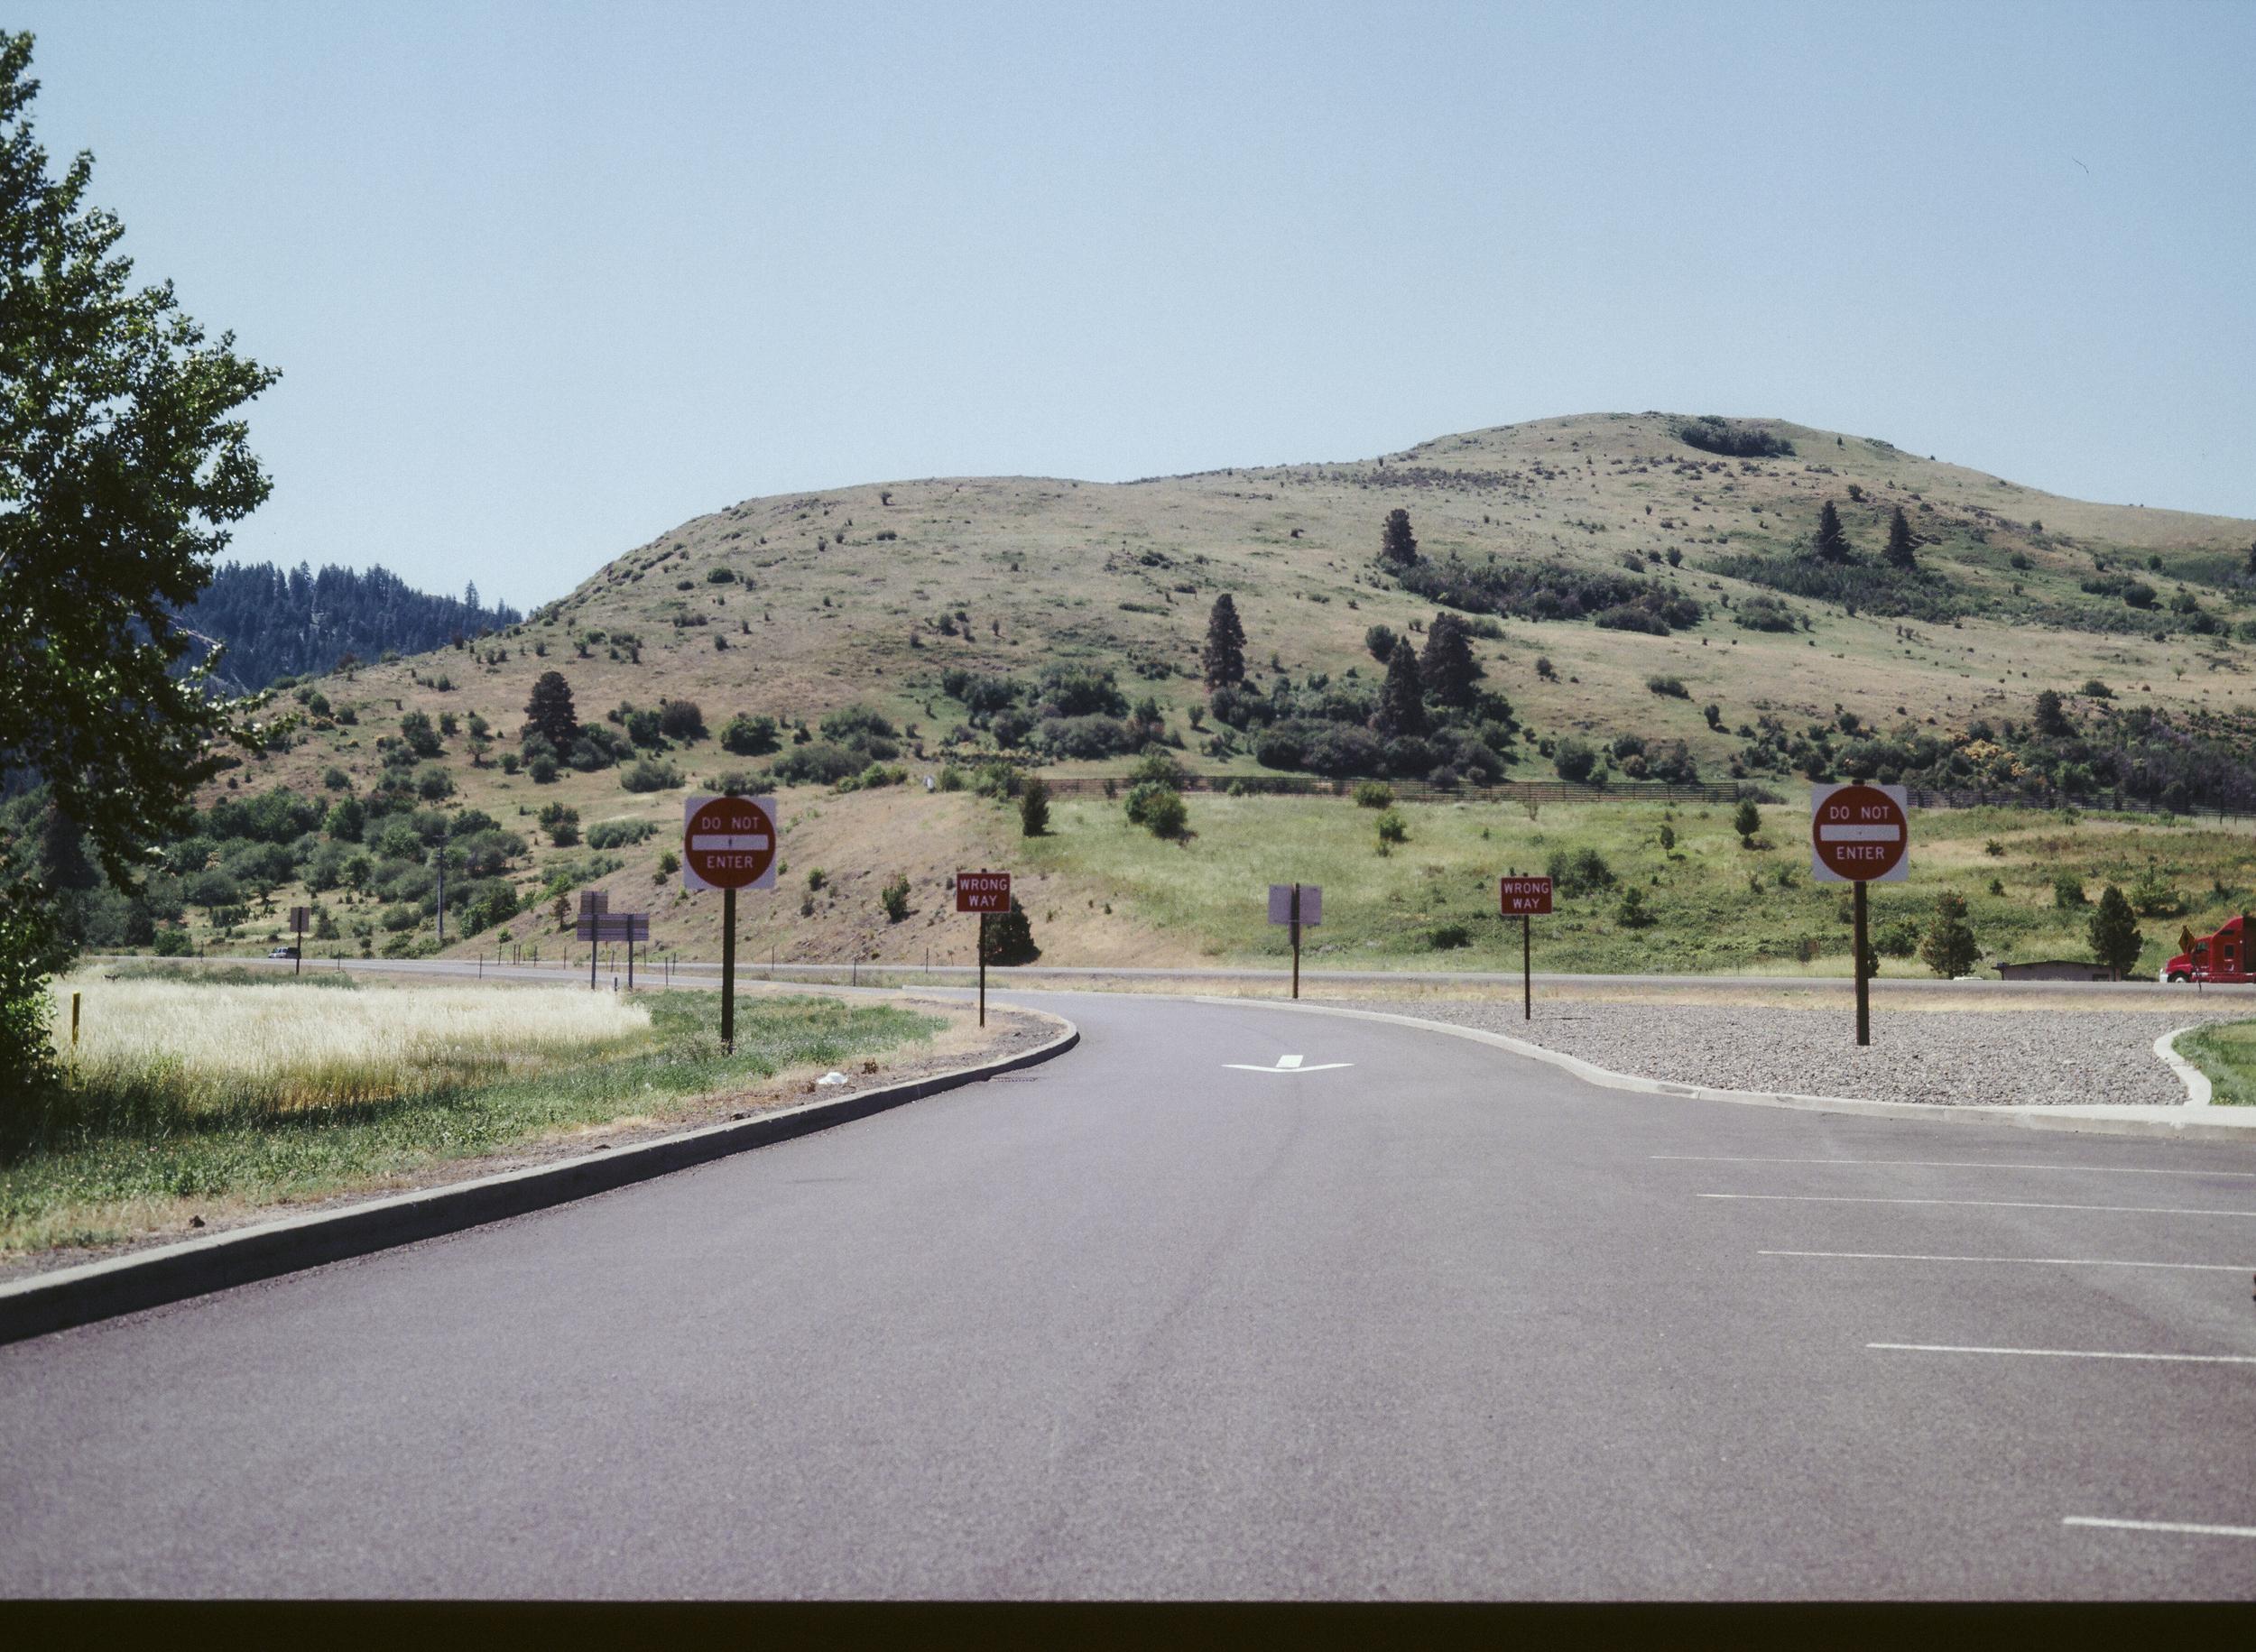 20130830_Idaho and Hiking15.jpg